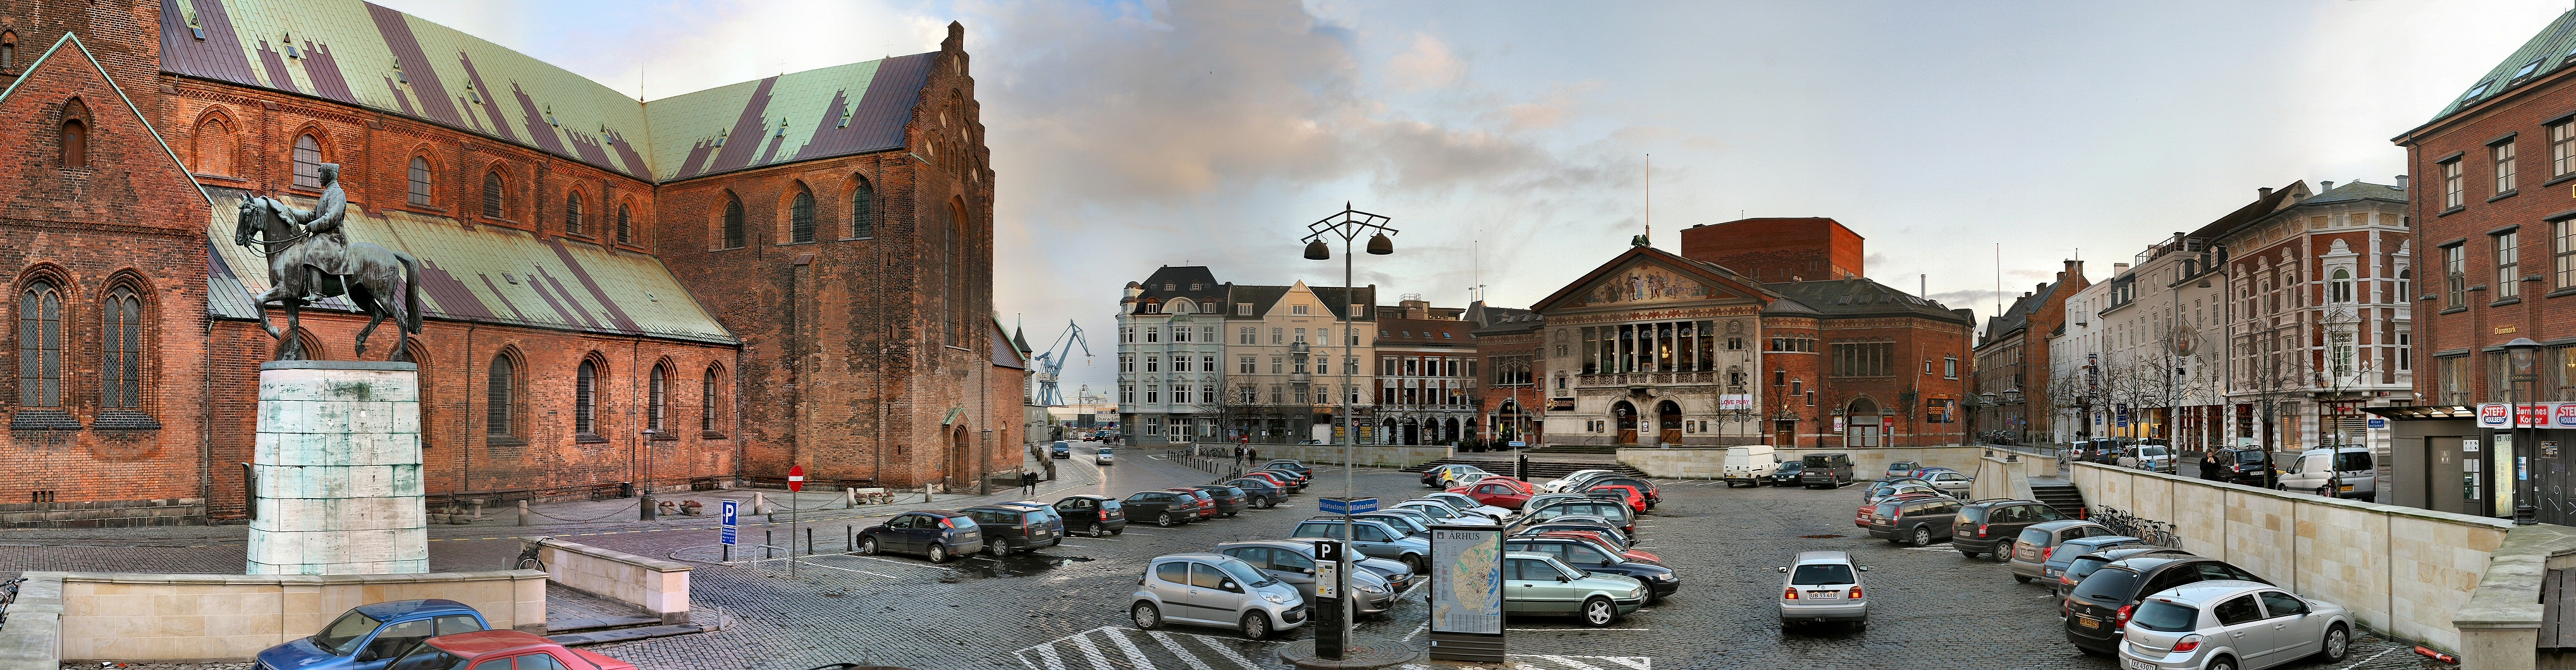 dating århus erotik dansk